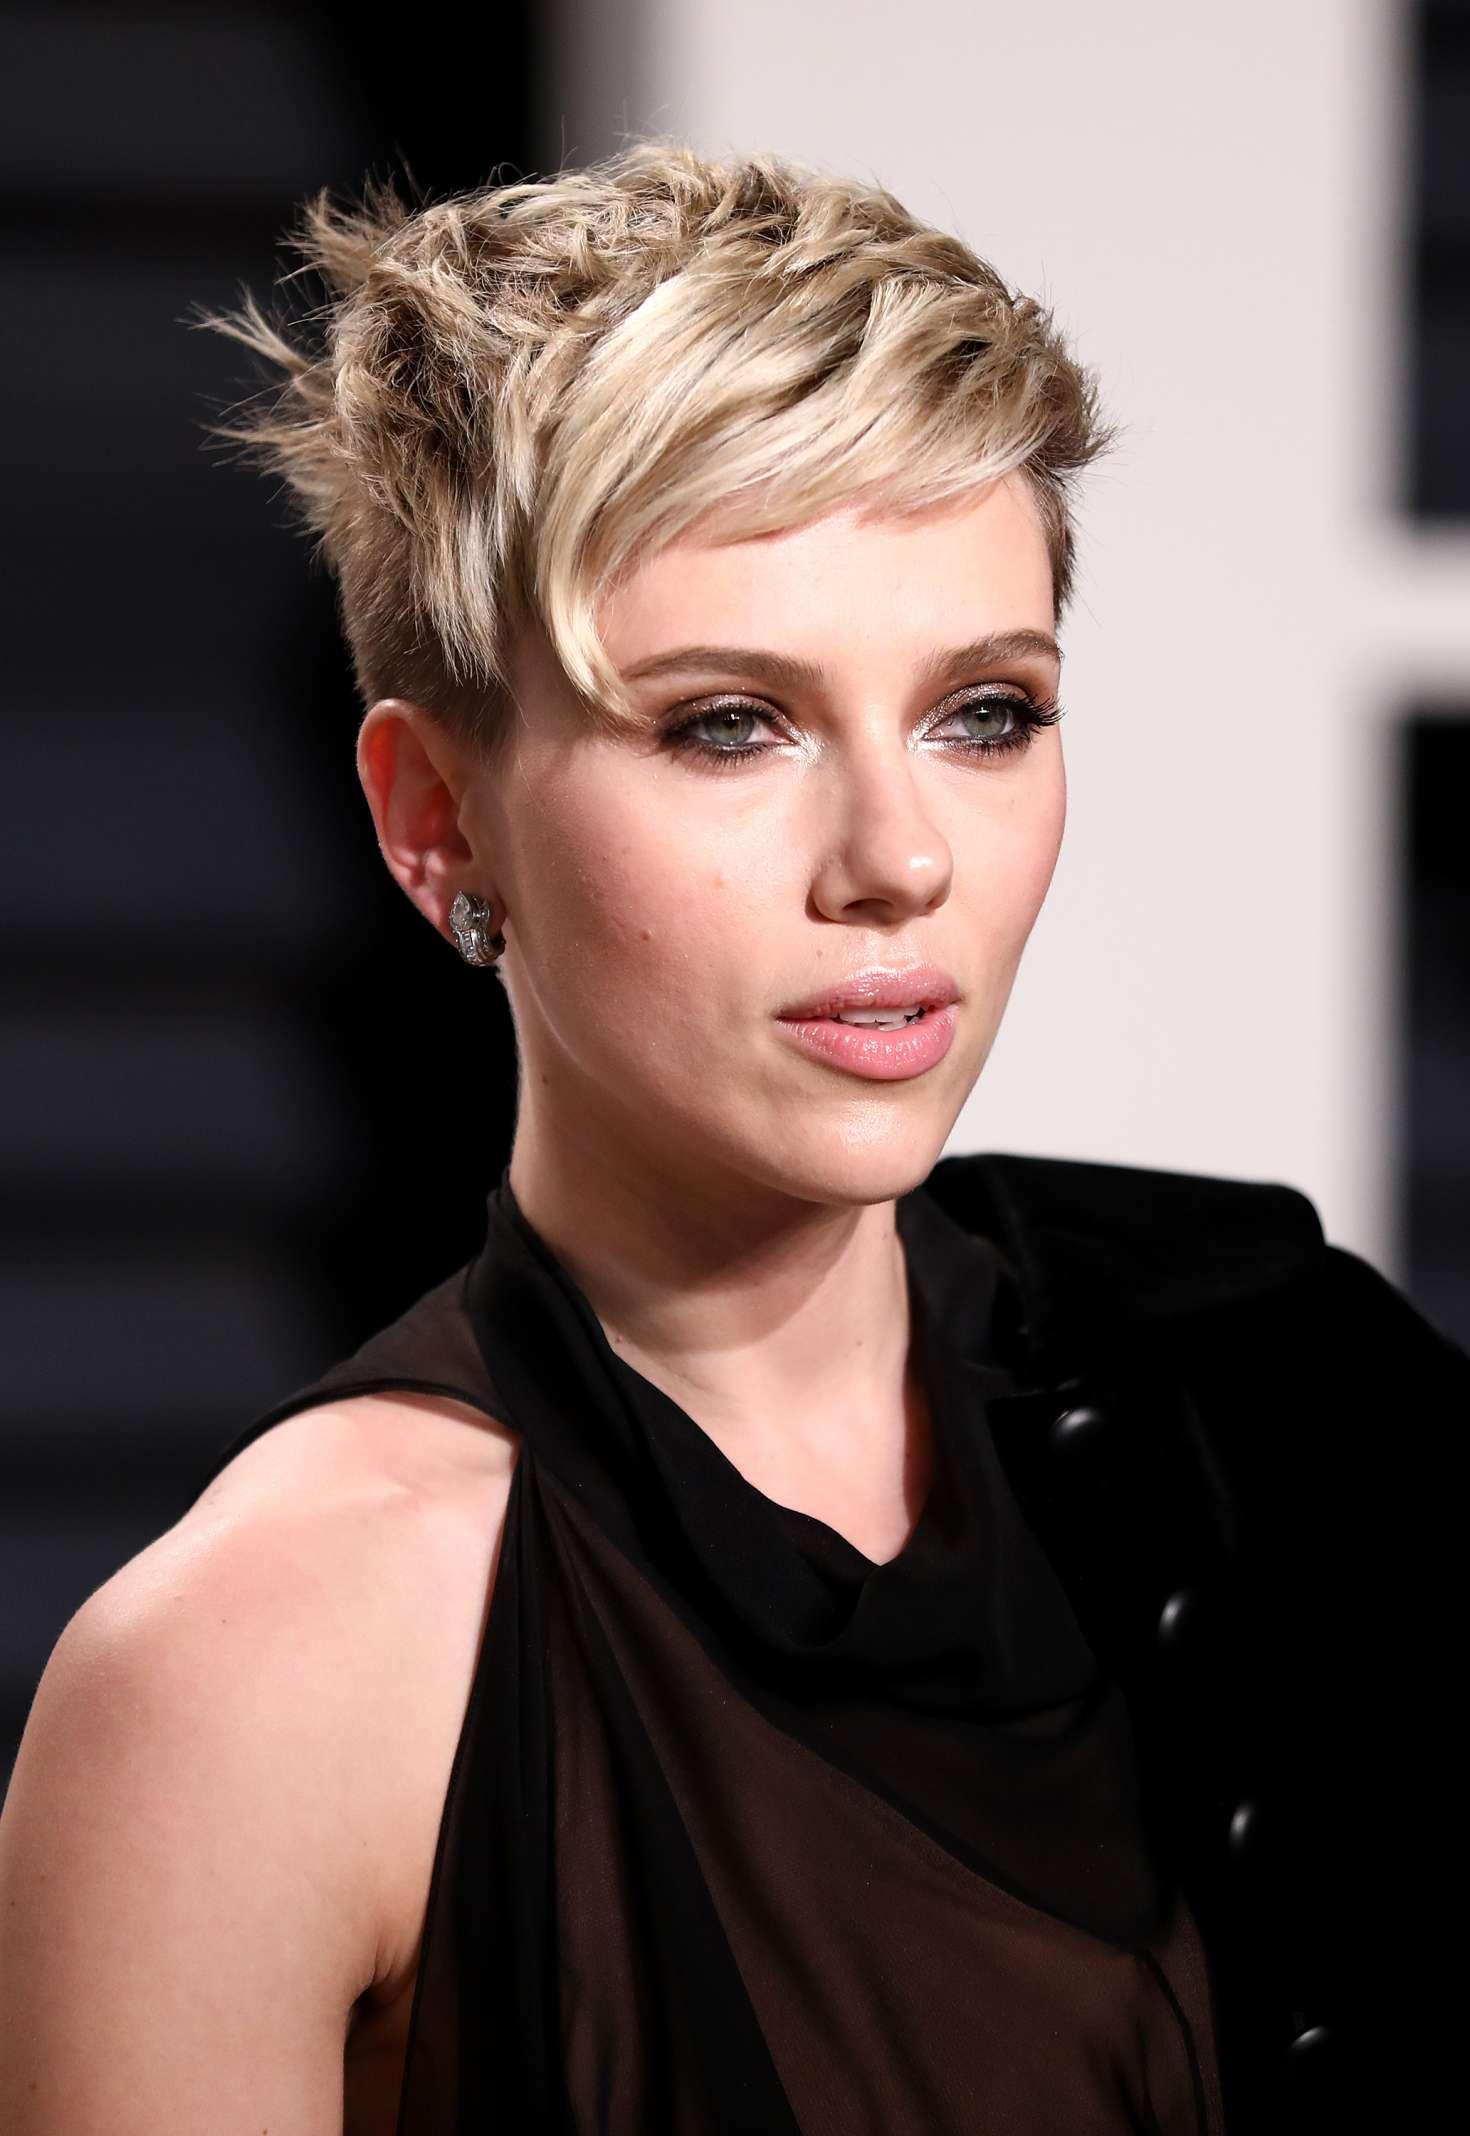 Johansson scarlett vanity fair march forecasting to wear for summer in 2019